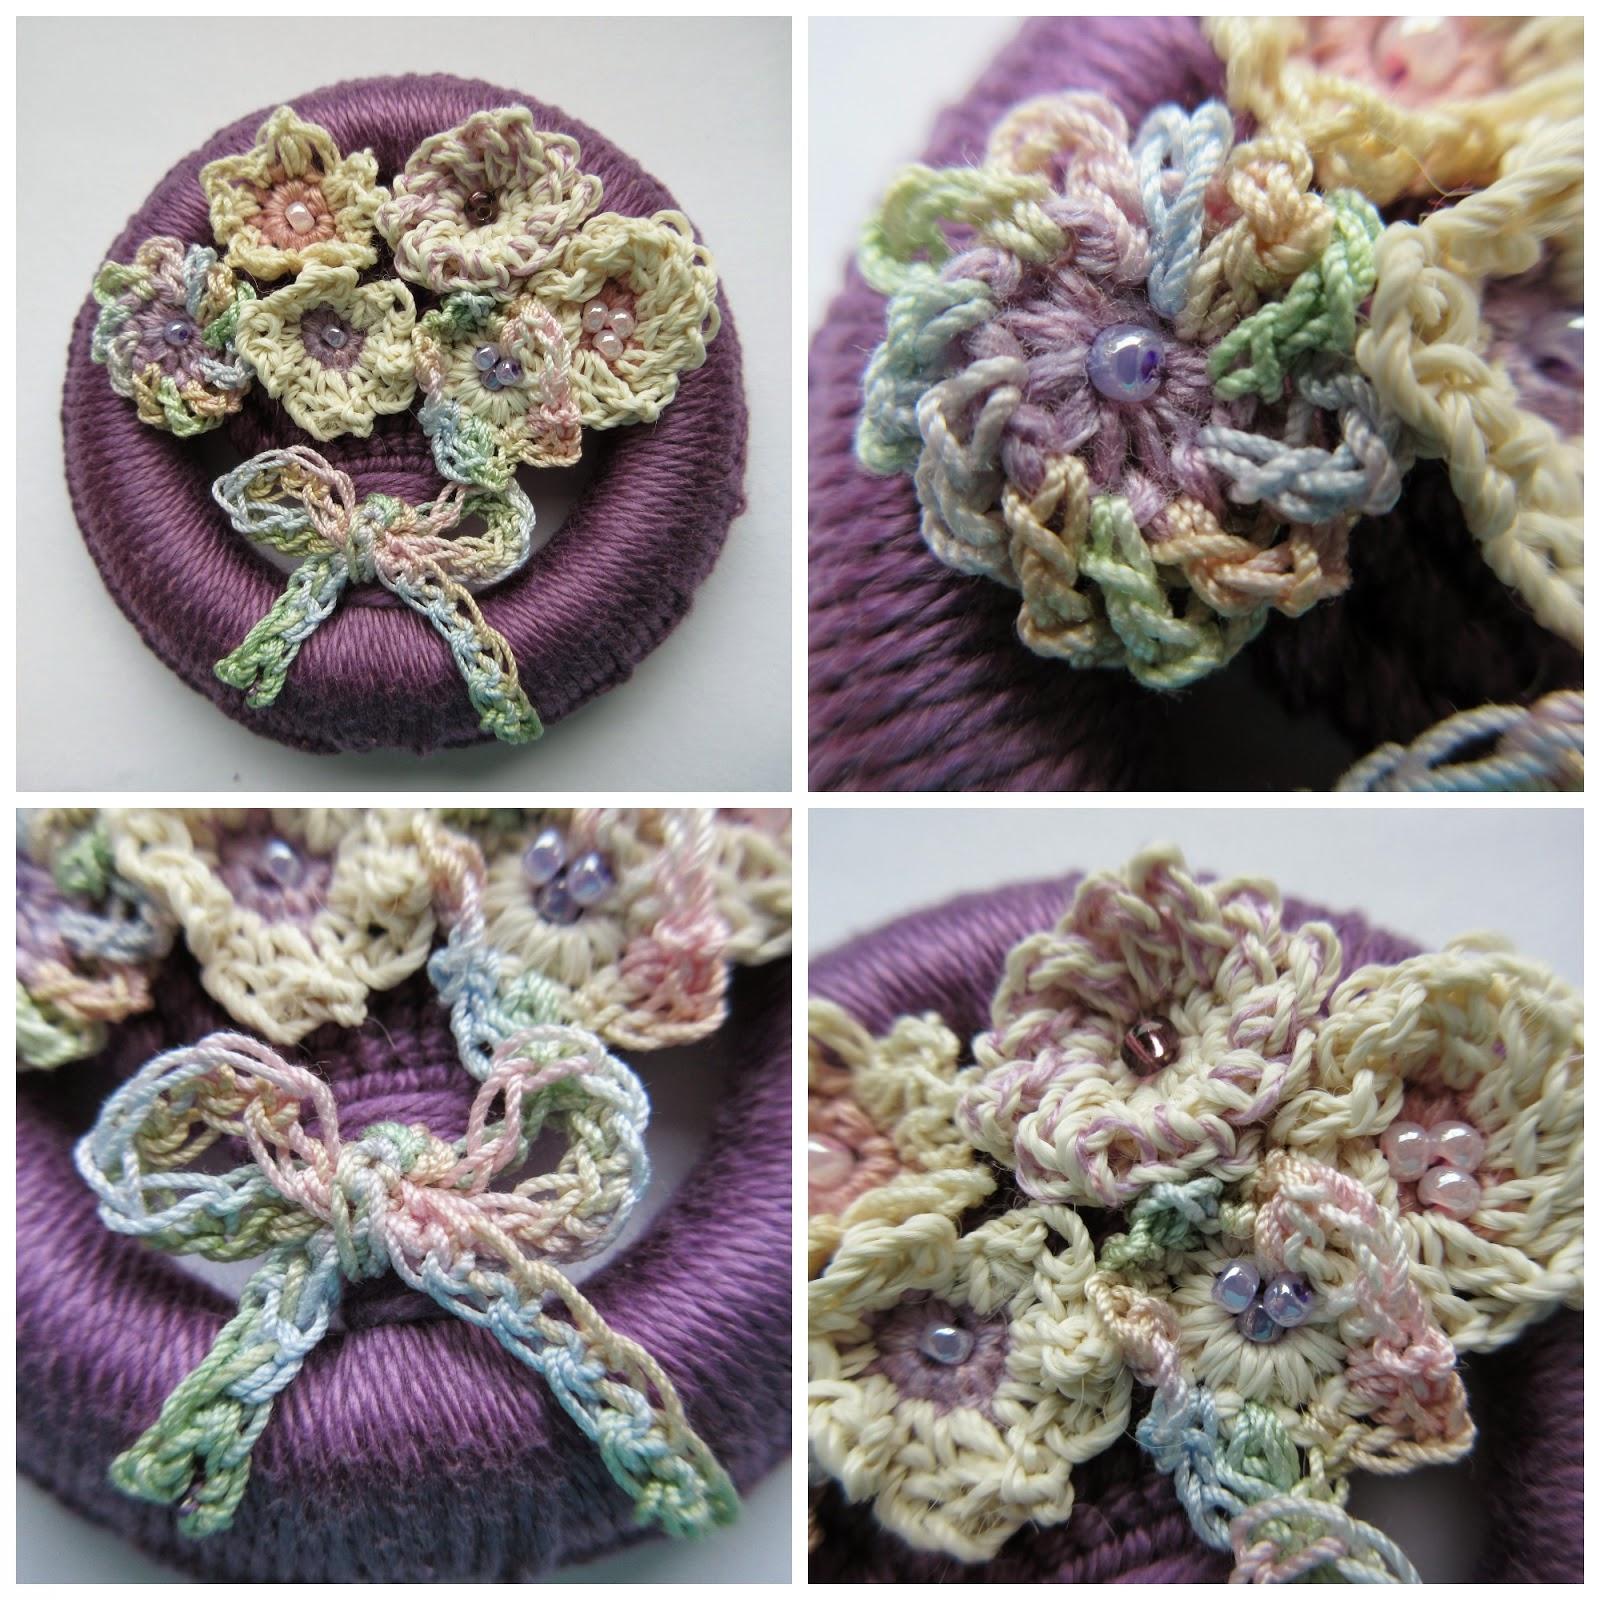 Dorset button with crochet flowers